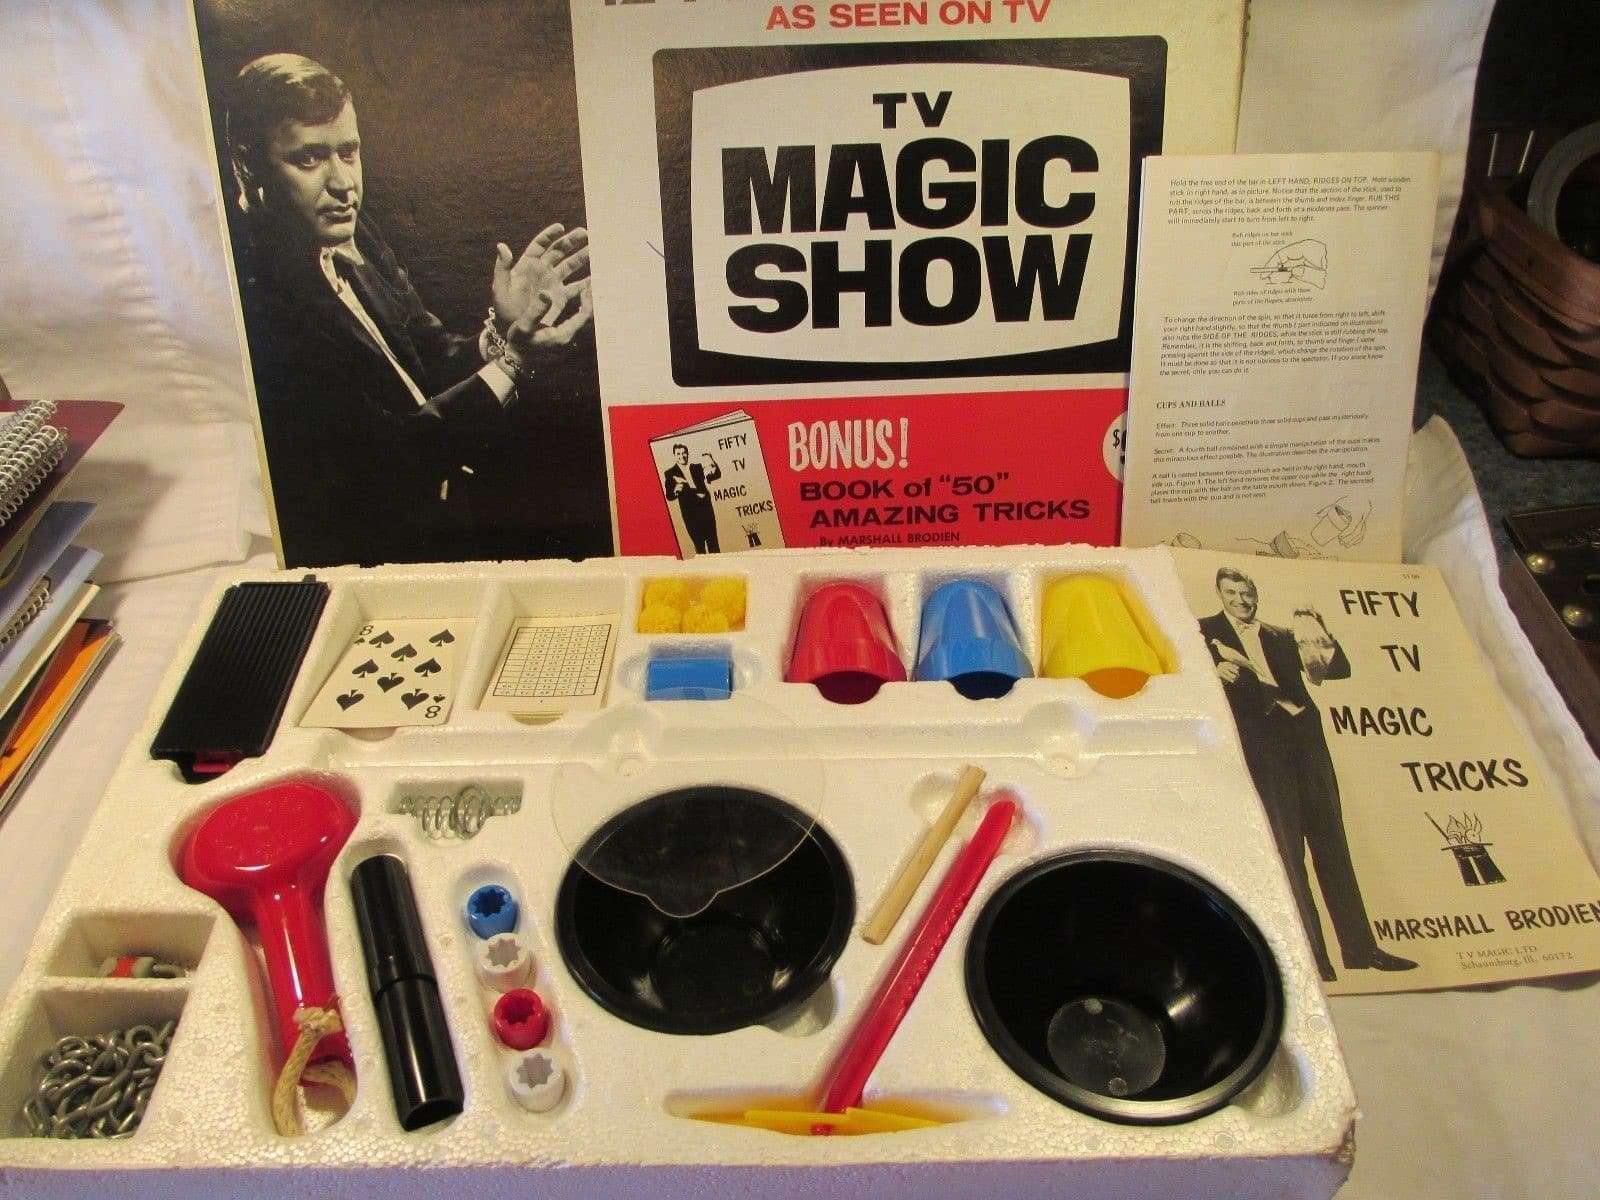 Magician Doug Roy